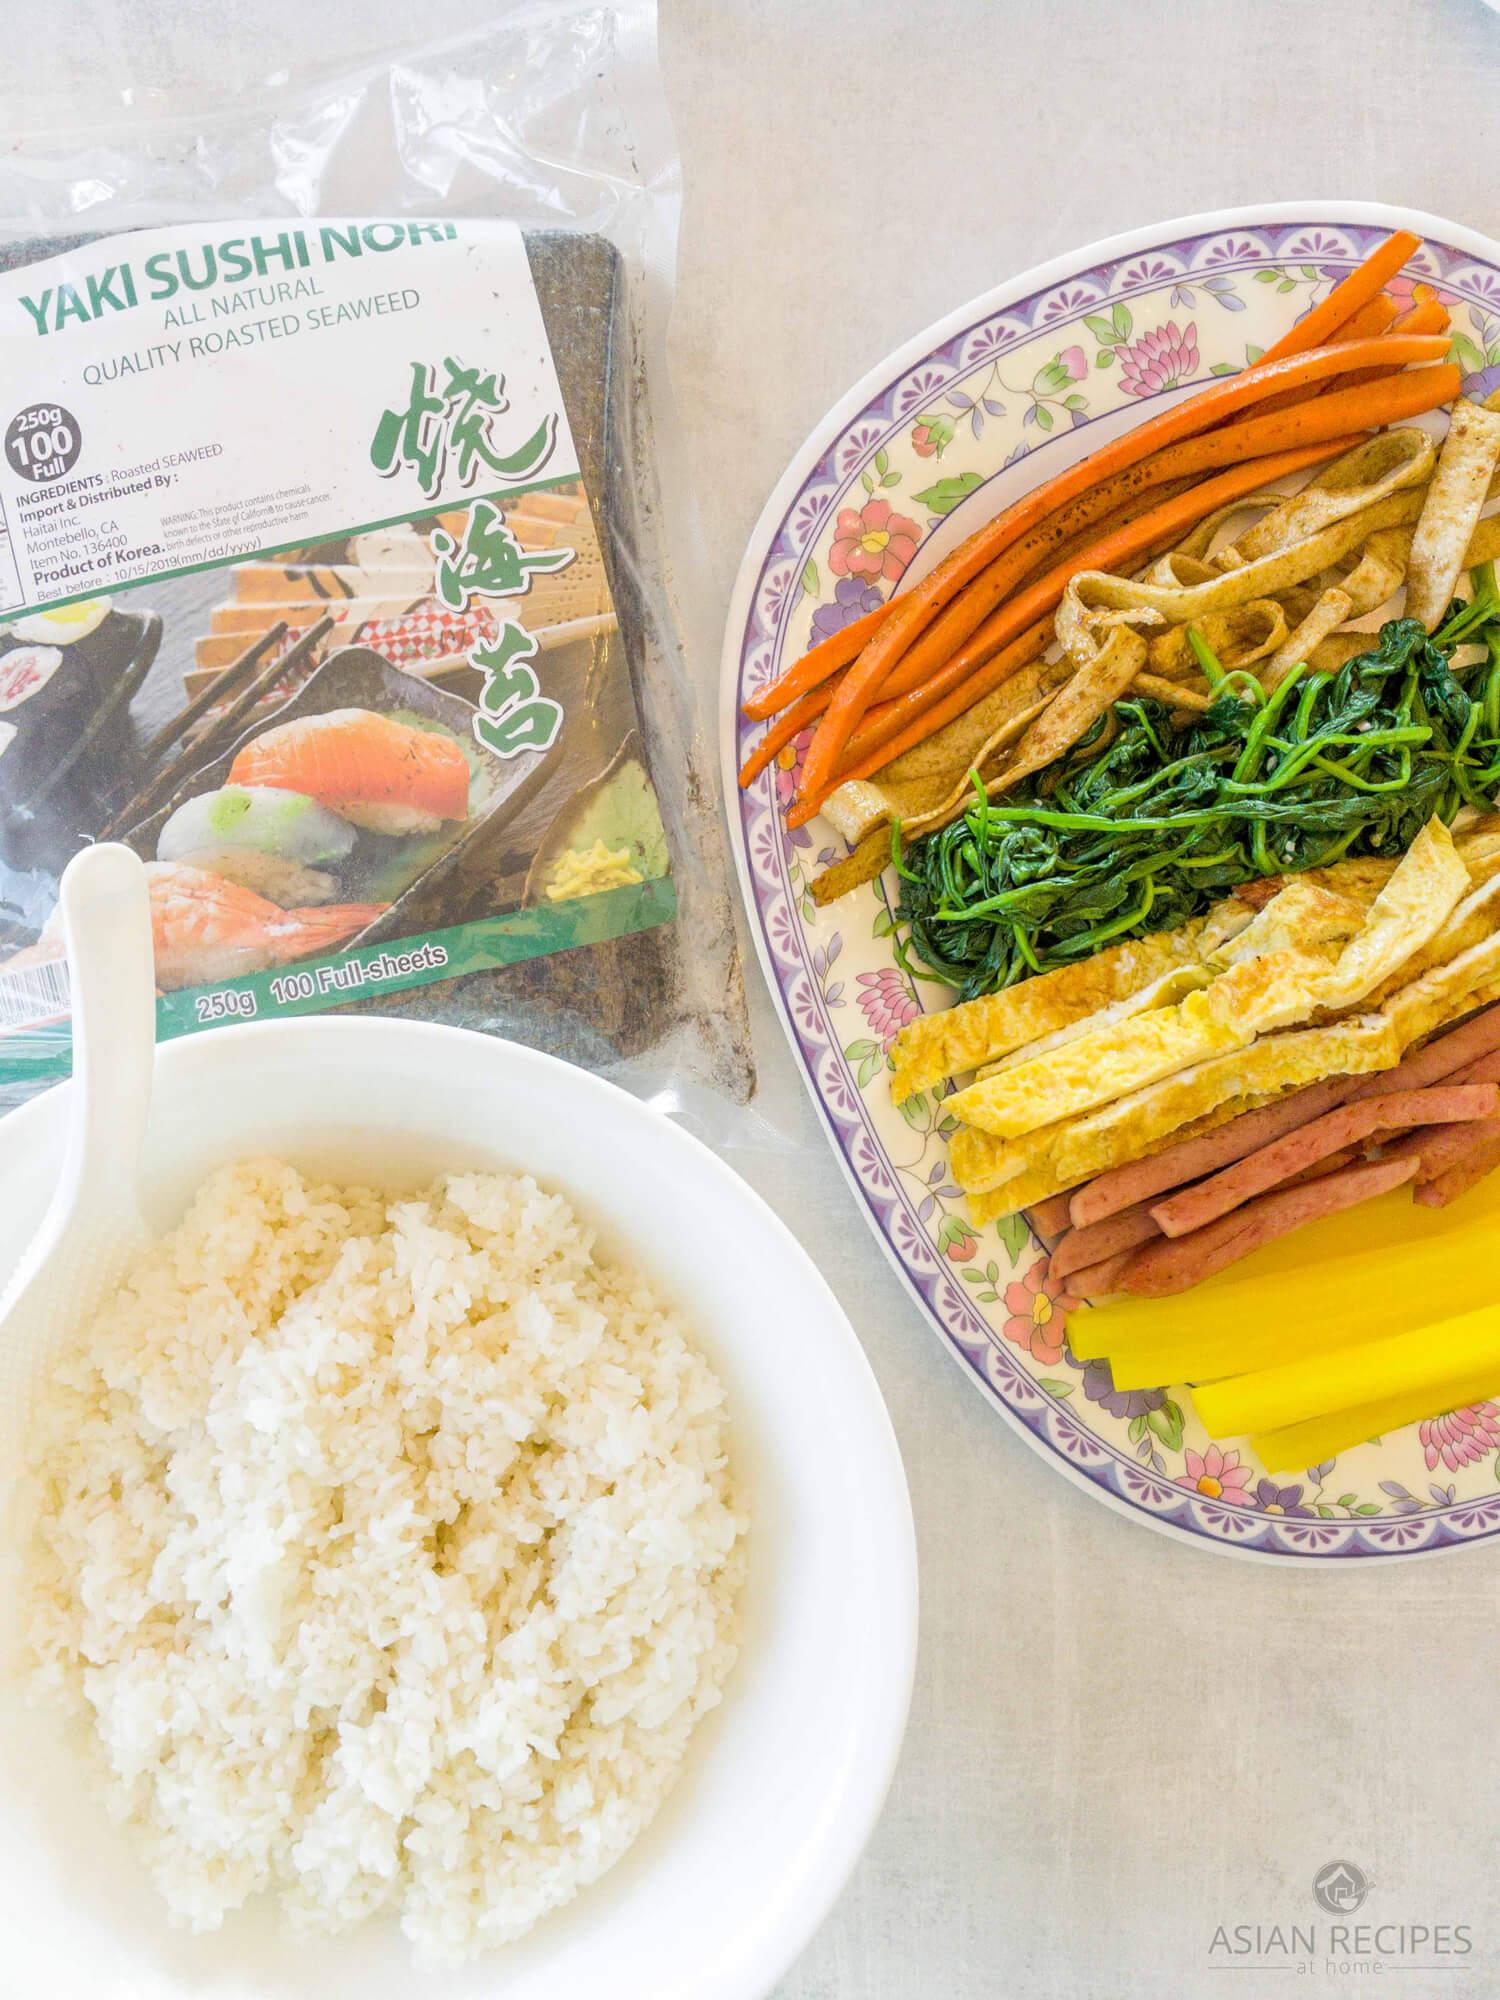 Ingredients needed to make our Korea kimbap recipe